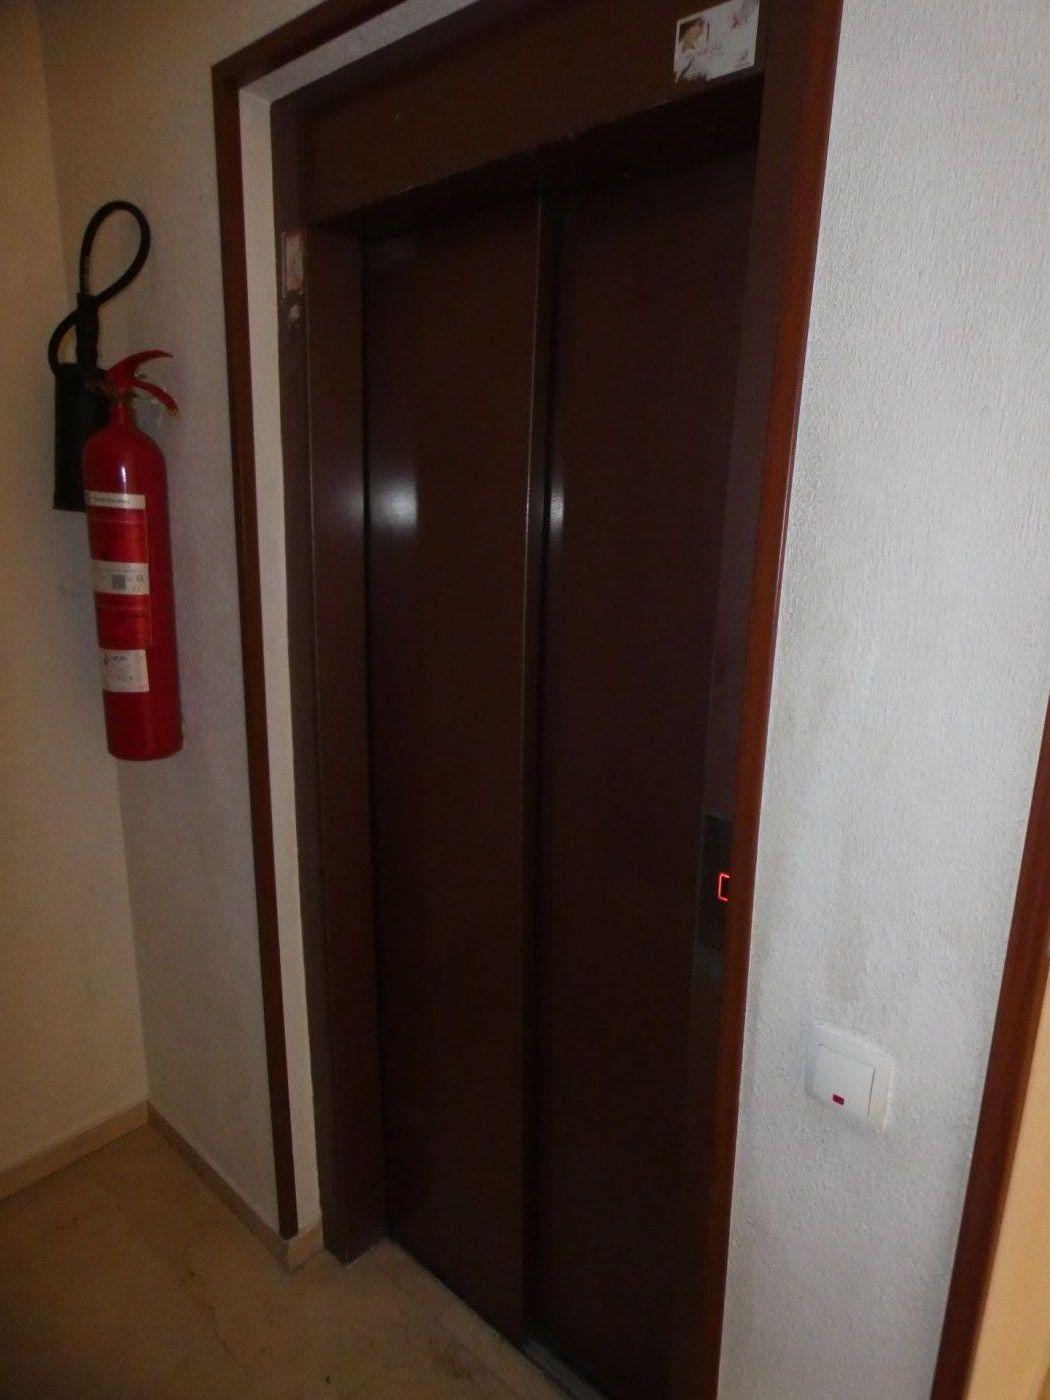 Piso 4 dormitorios tombola - imagenInmueble22